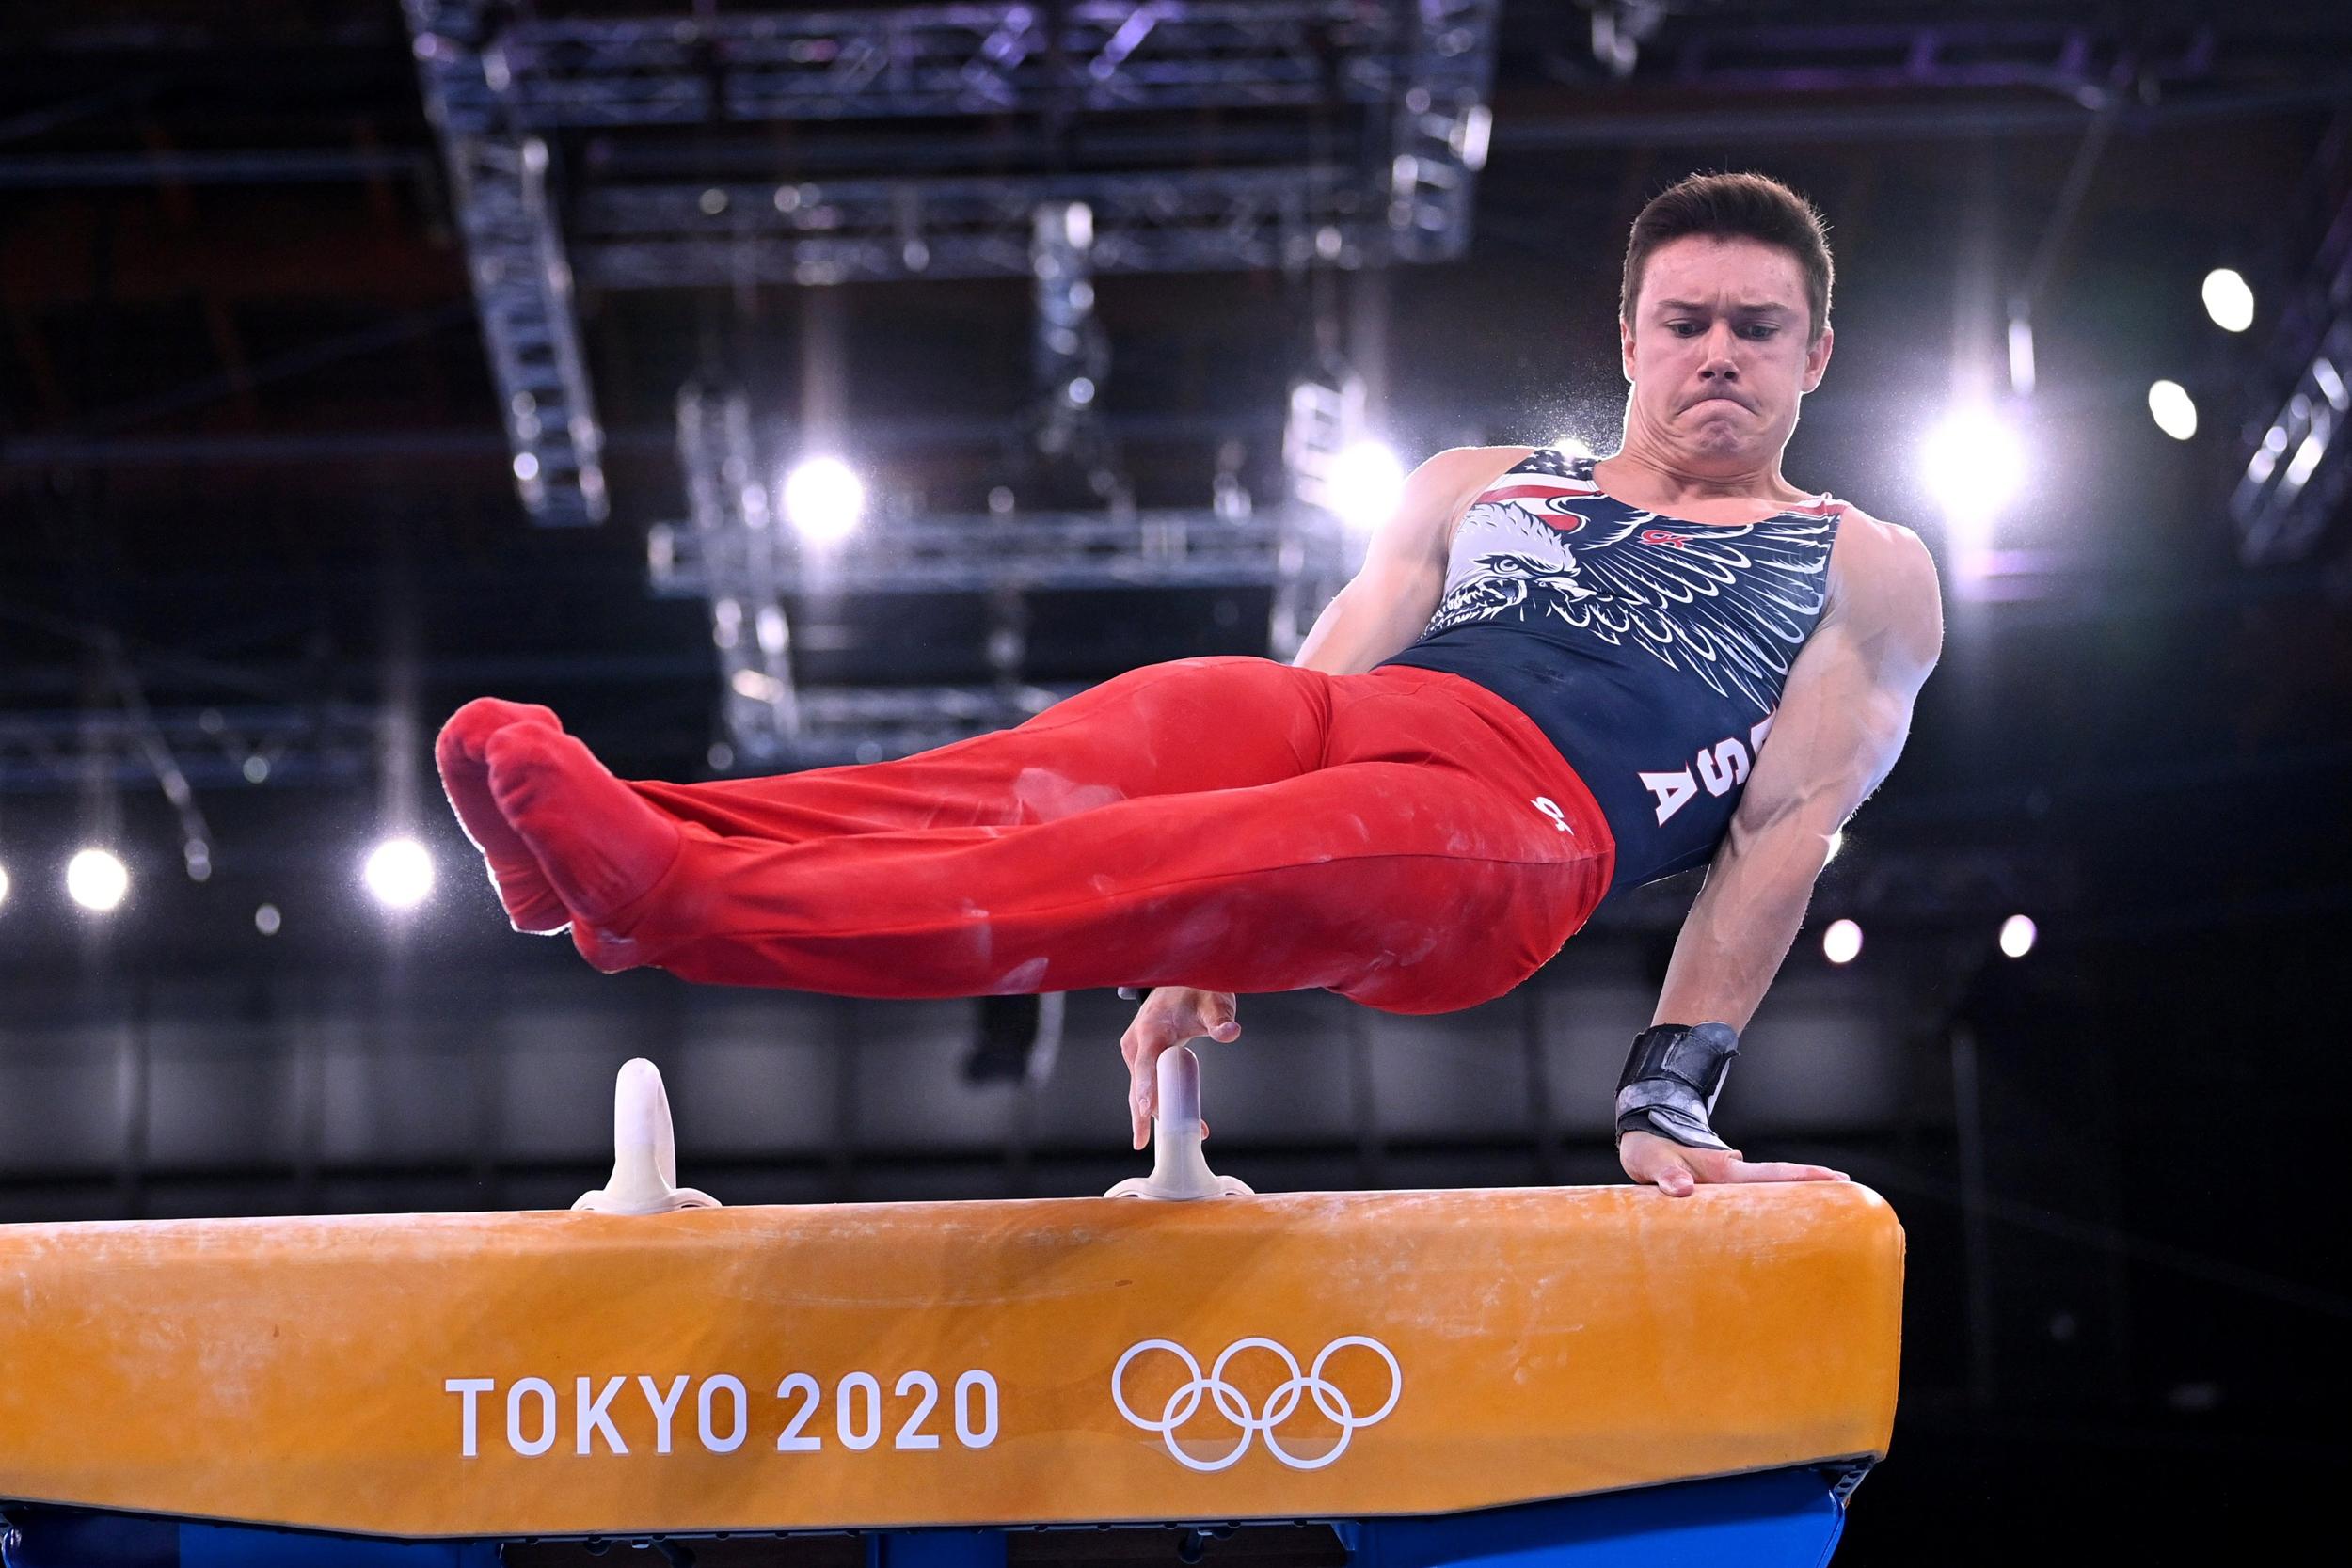 Watch live: Men's individual all-around gymnastics final